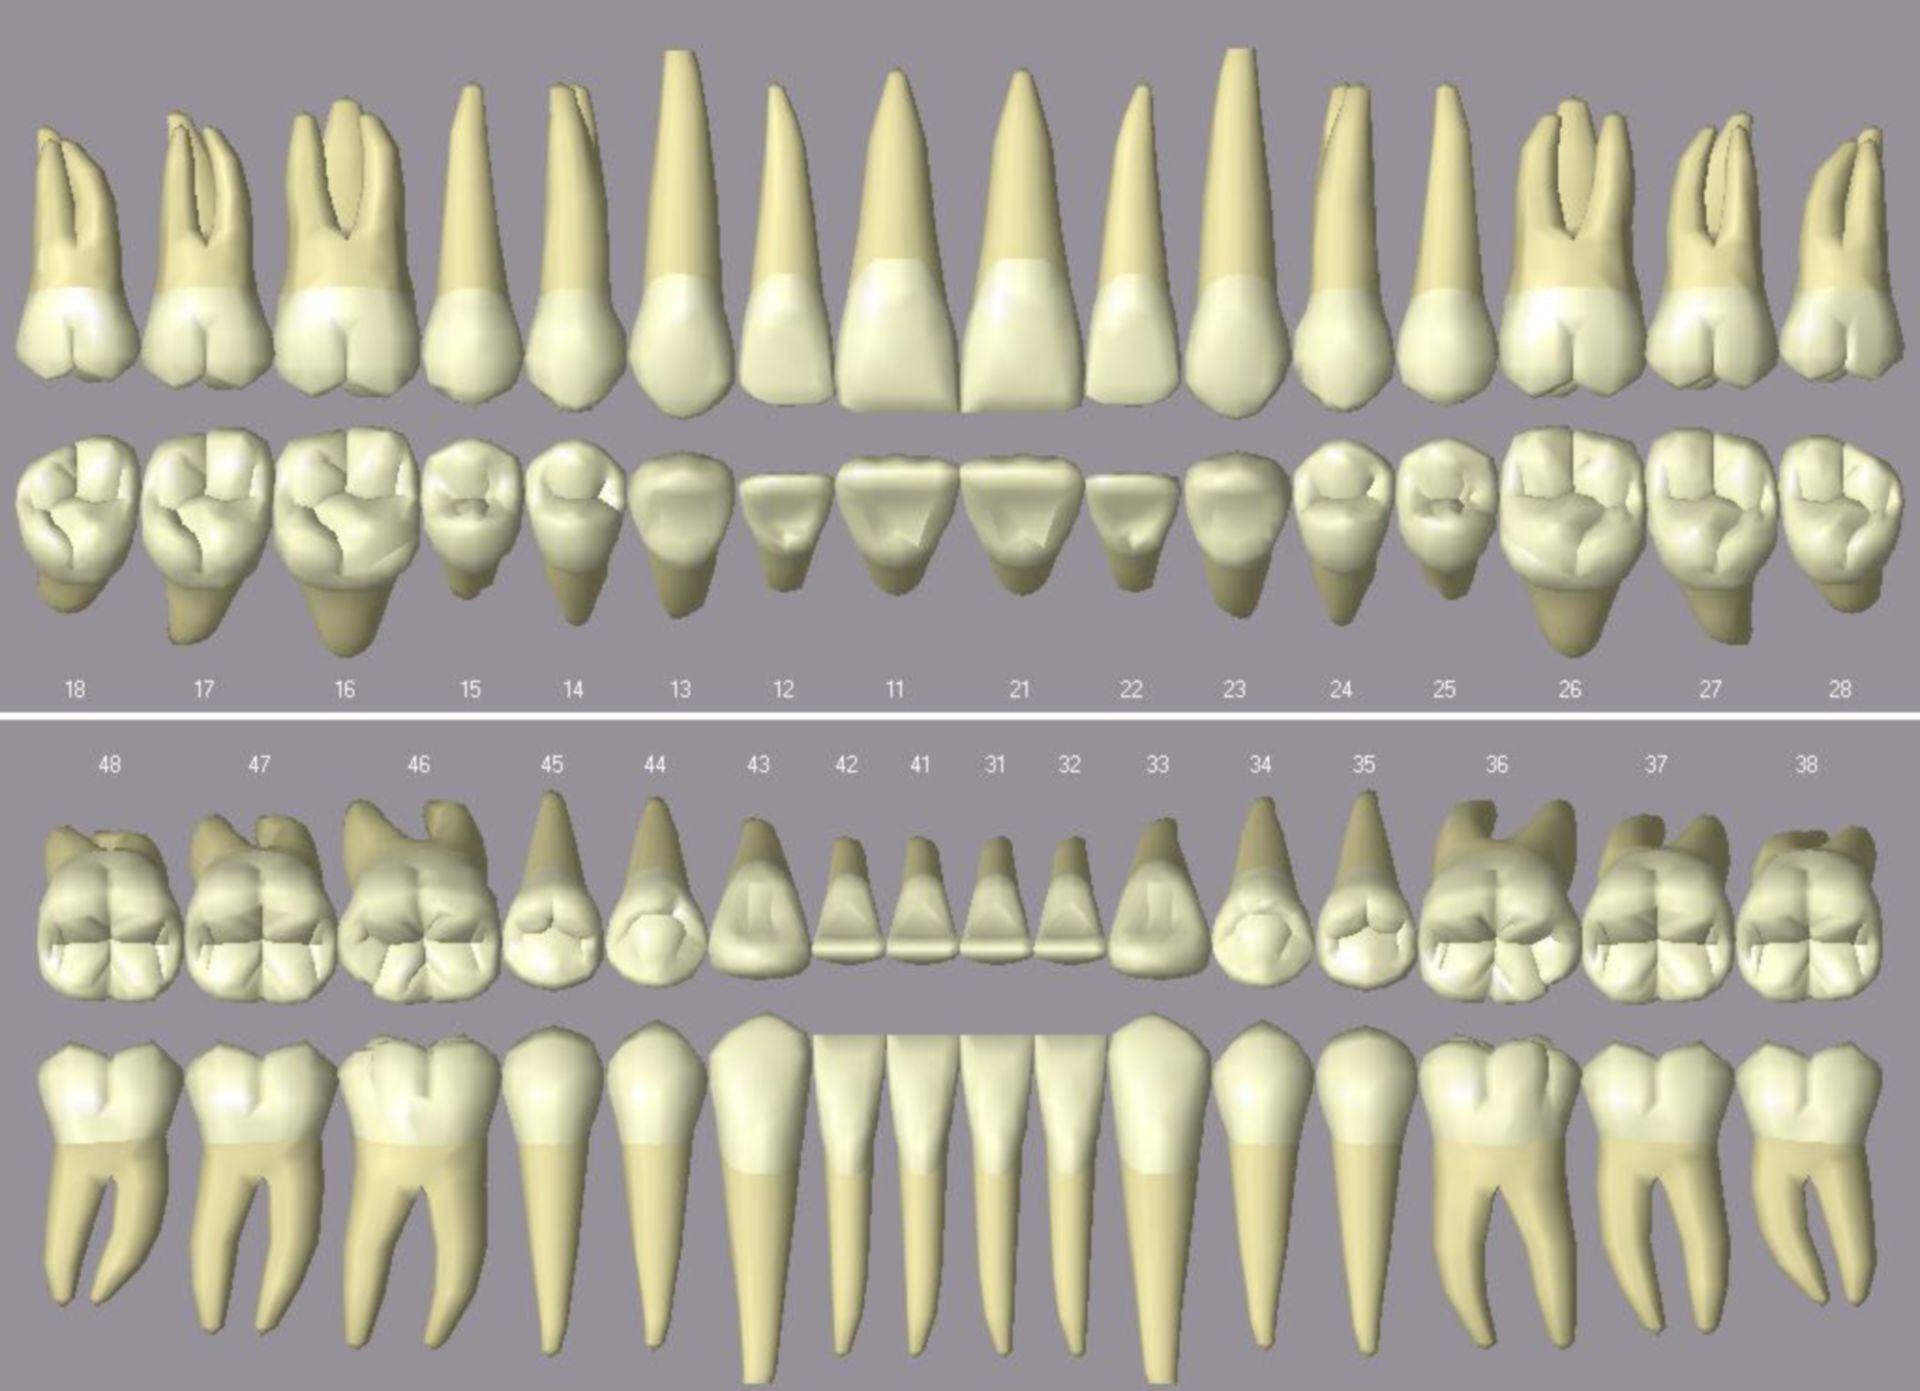 Human teeth (computer graphic)